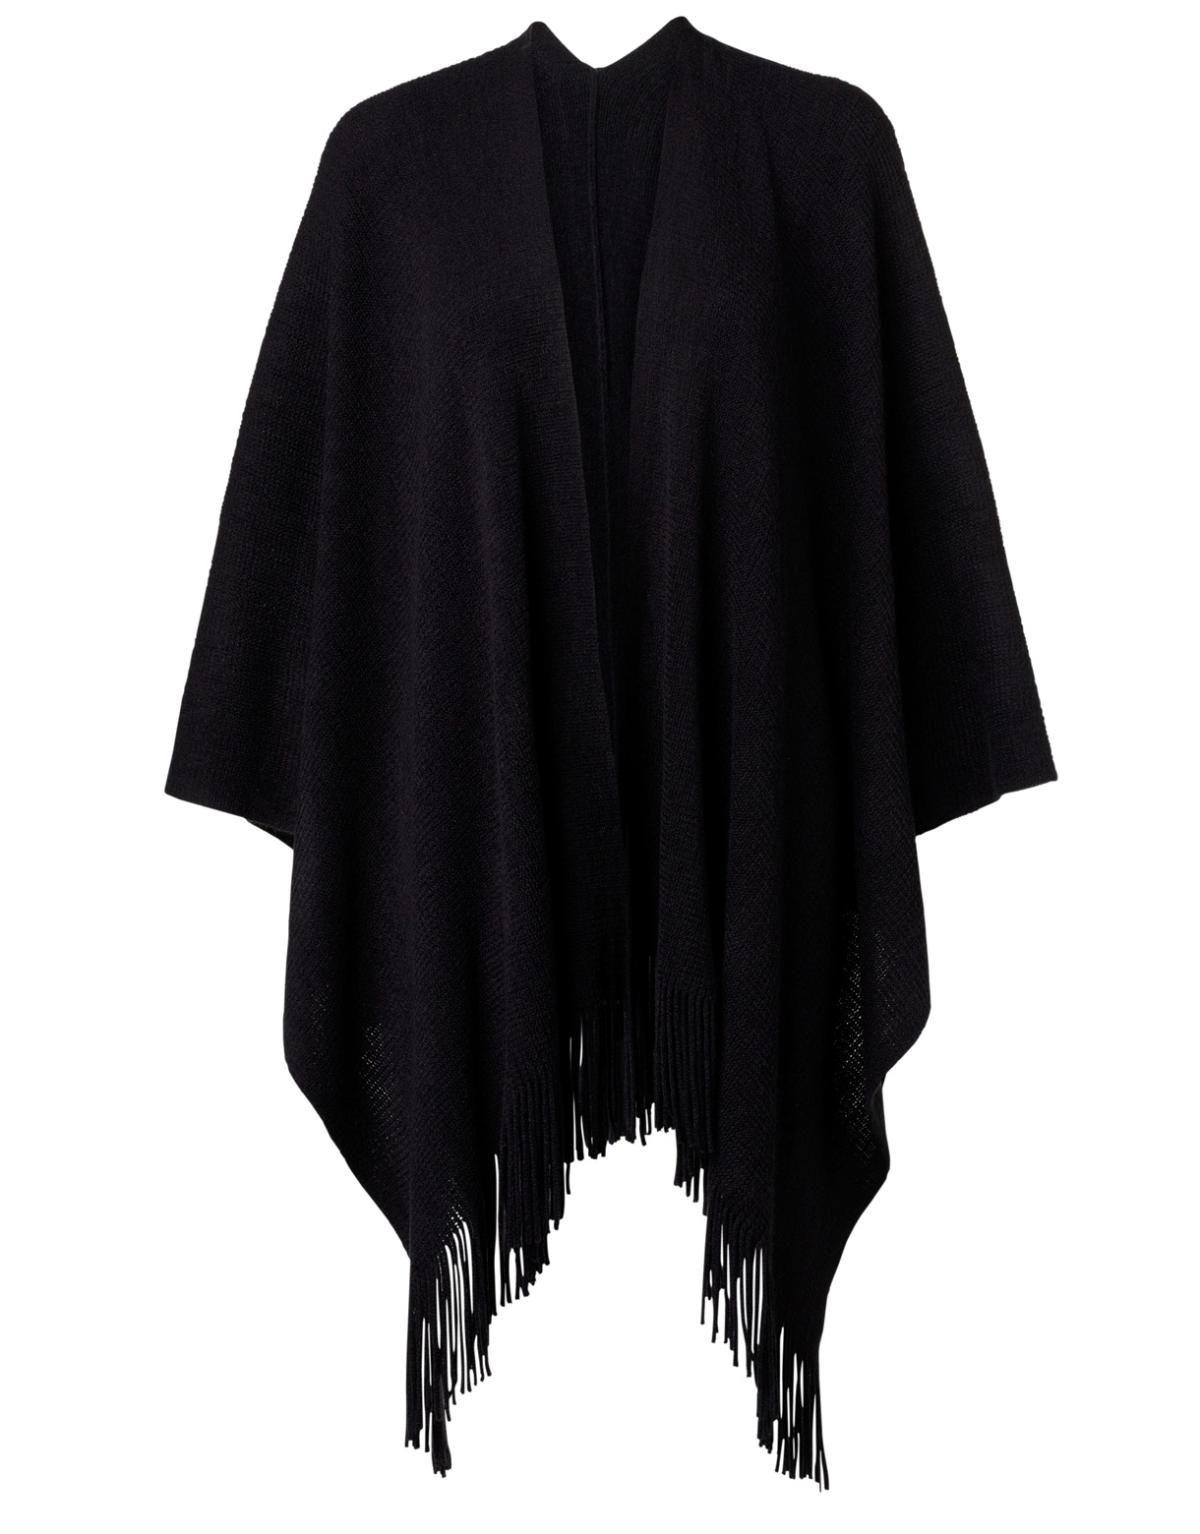 PLAIN poncho svart | Scarves | Sjalar & halsdukar | Accessoarer | INDISKA Shop Online